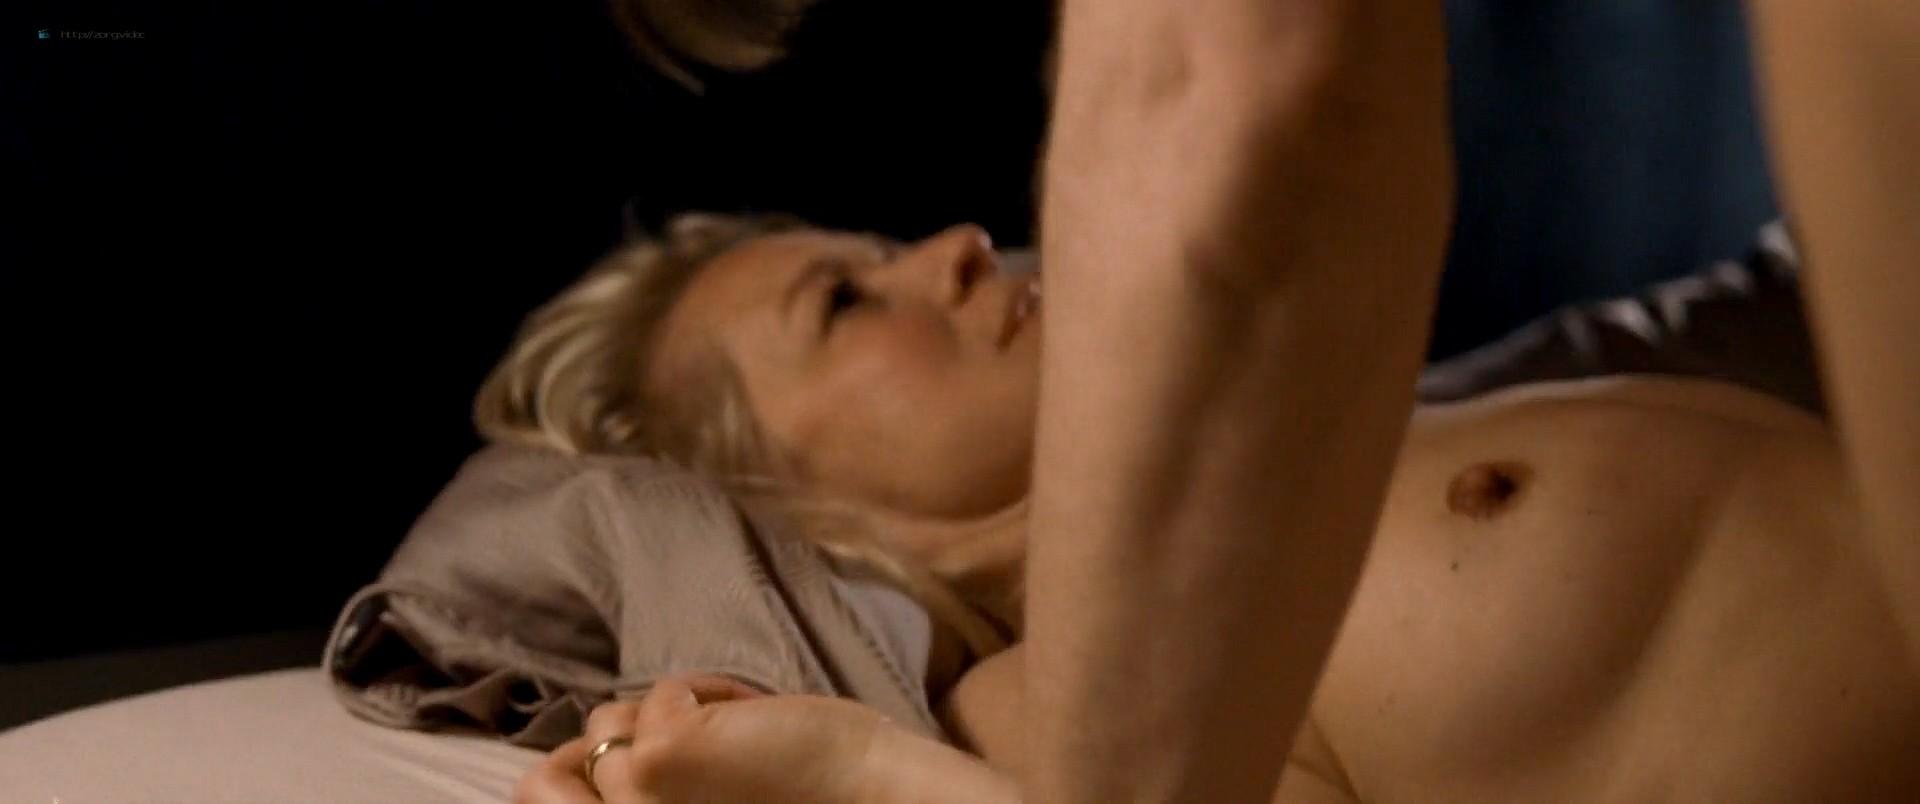 Trine Dyrholm nude explicit blow job and hot sex - Queen of Hearts (DK-2019) 1080p WEB (6)